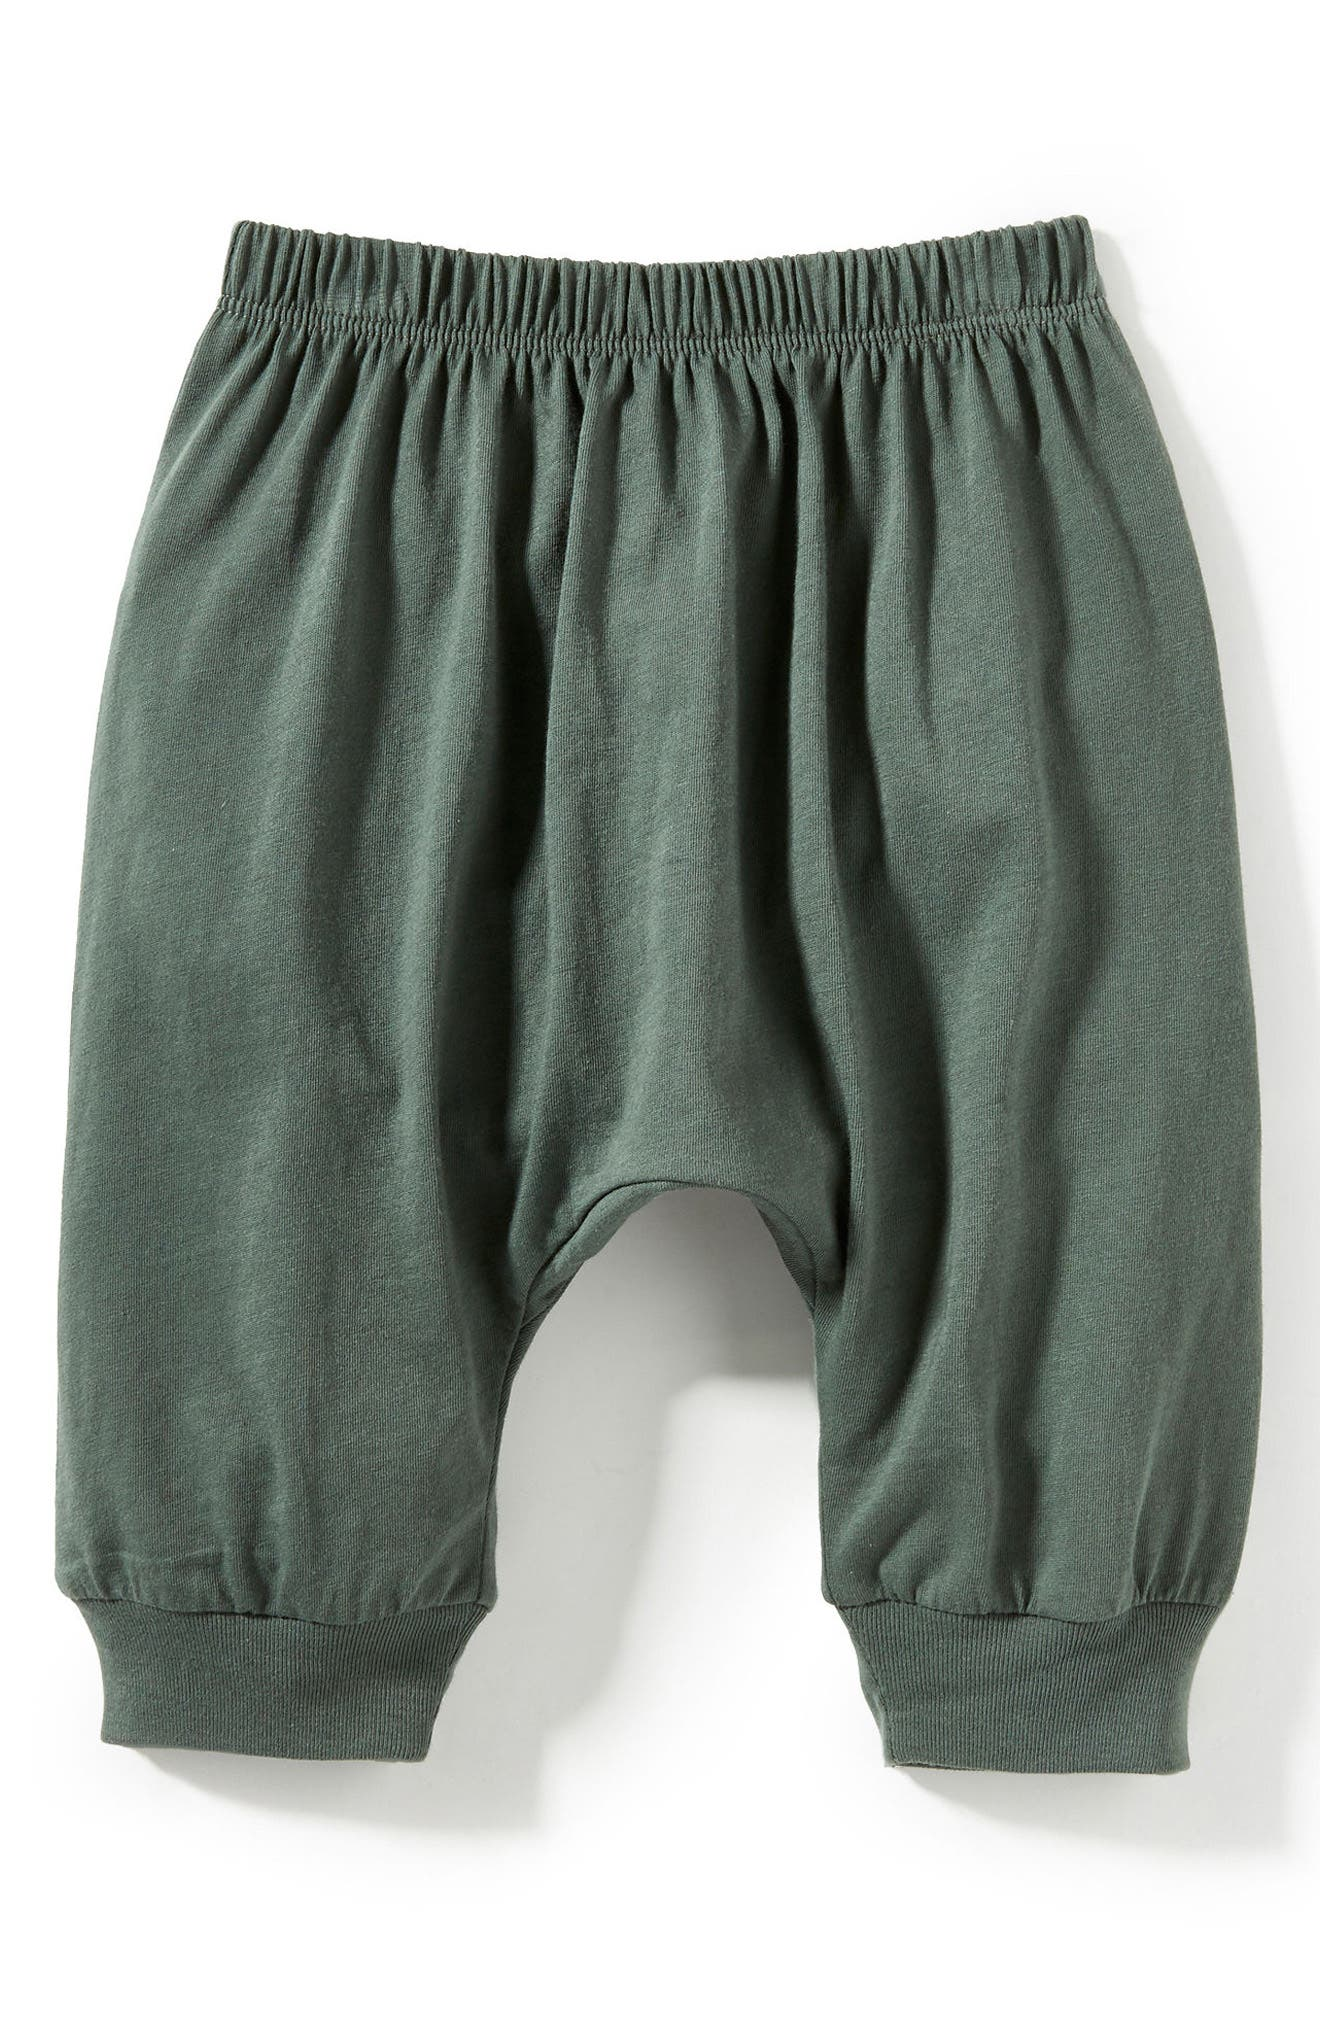 Main Image - Peek Little Peanut Jogger Pants (Baby Boys)